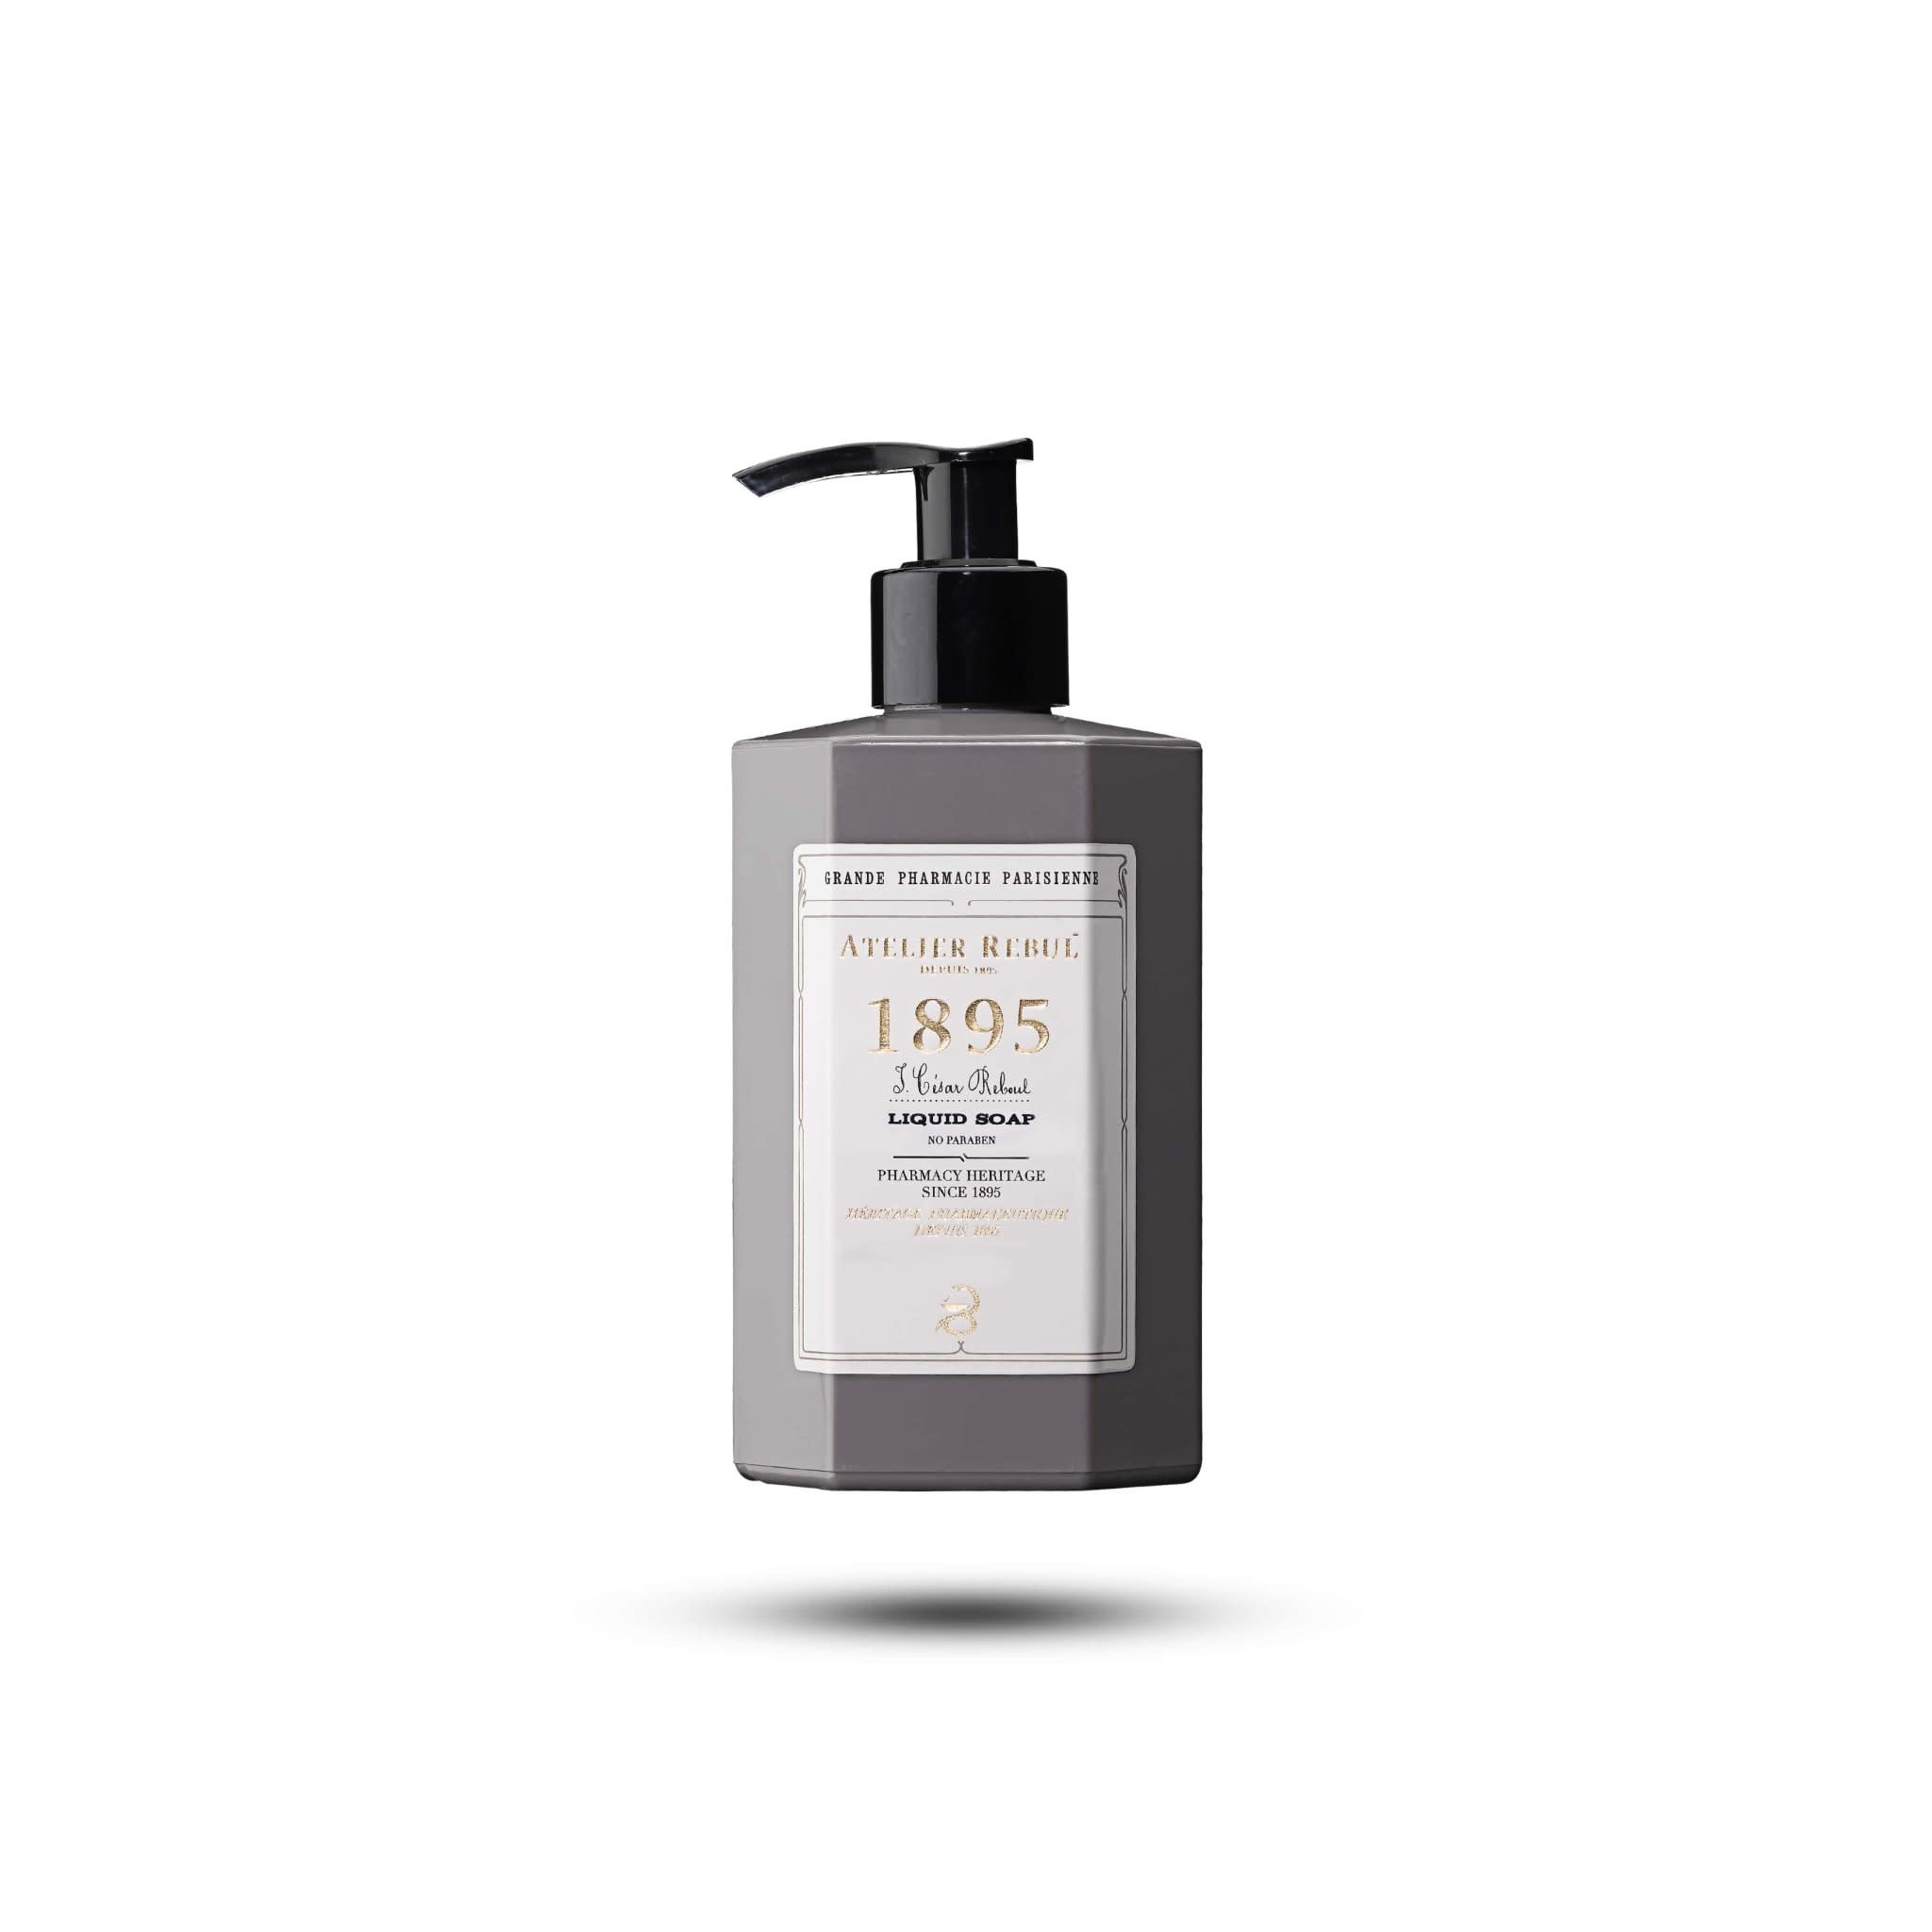 Atelier Rebul Atelier Rebul 1895 liquid soap 250 ml.